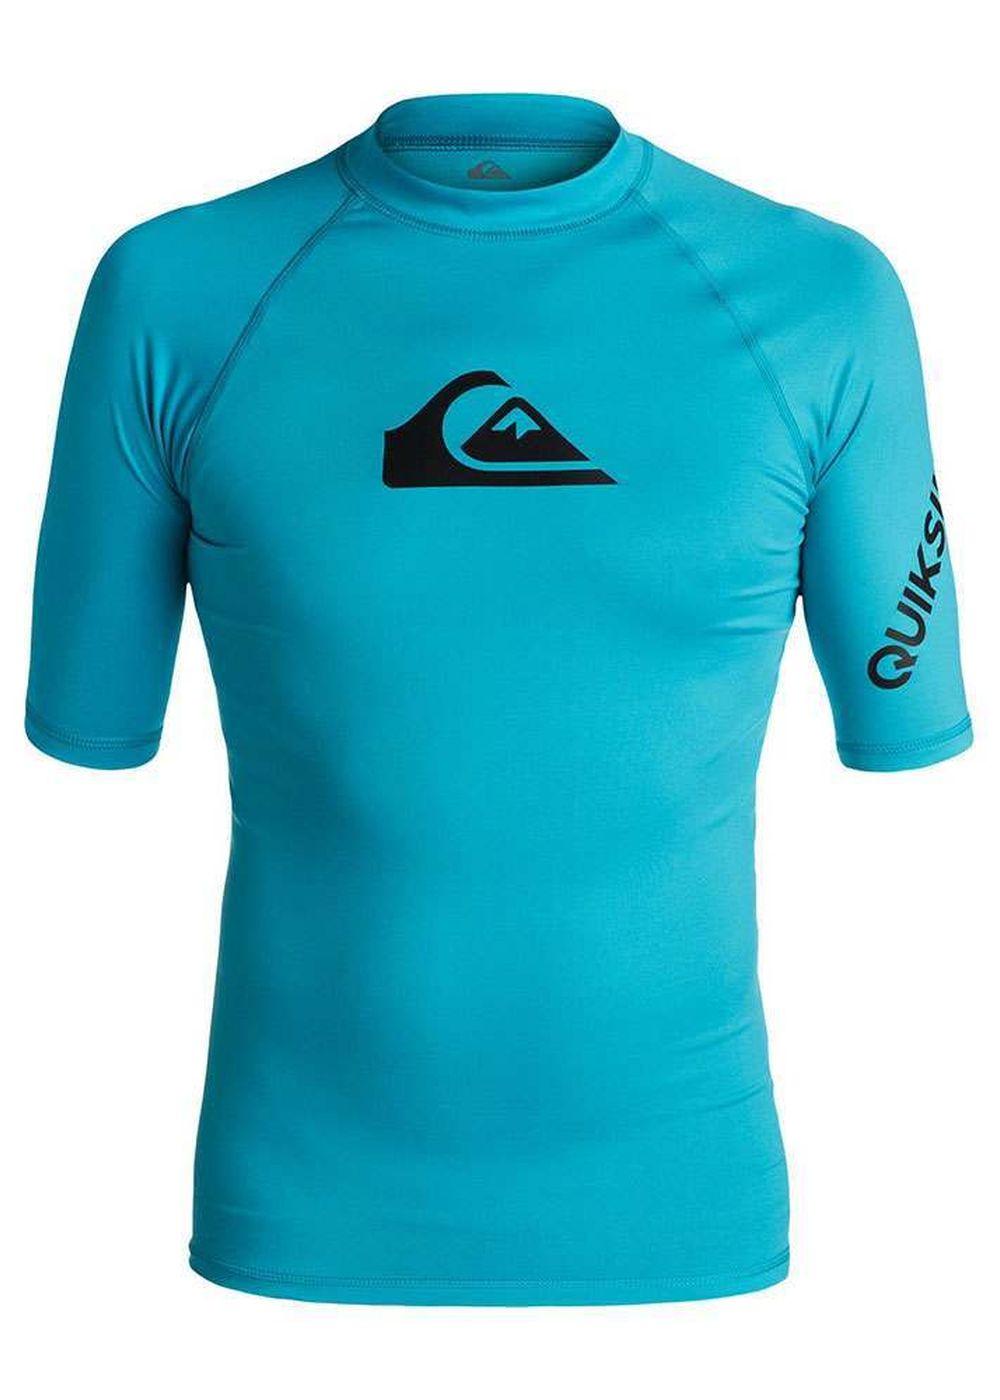 Quiksilver All Time Short Sleeve Rash Vest Blue Picture